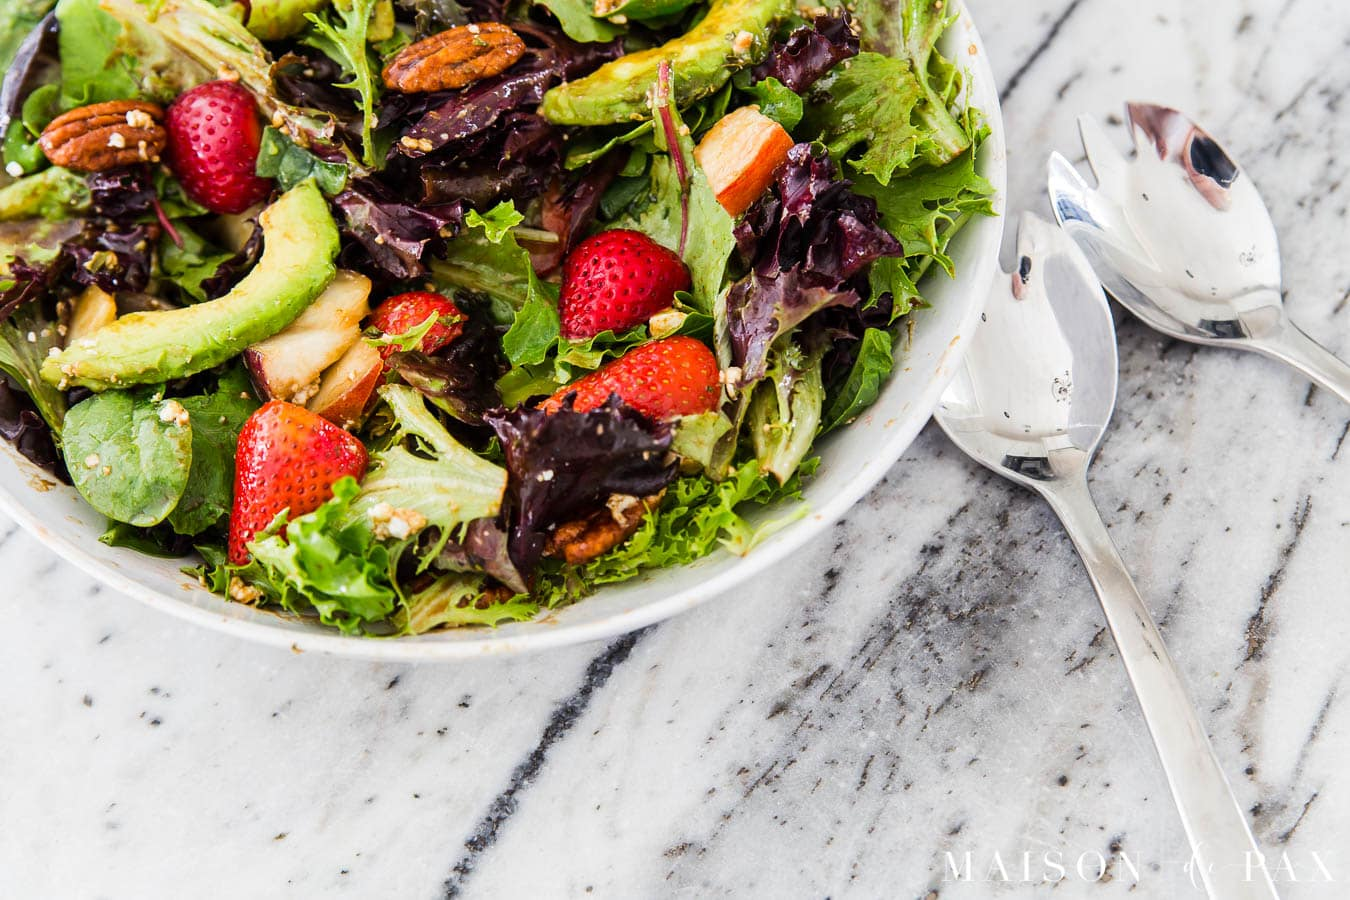 mixed greens salad with avocado, pecans, feta, and more | Maison de Pax